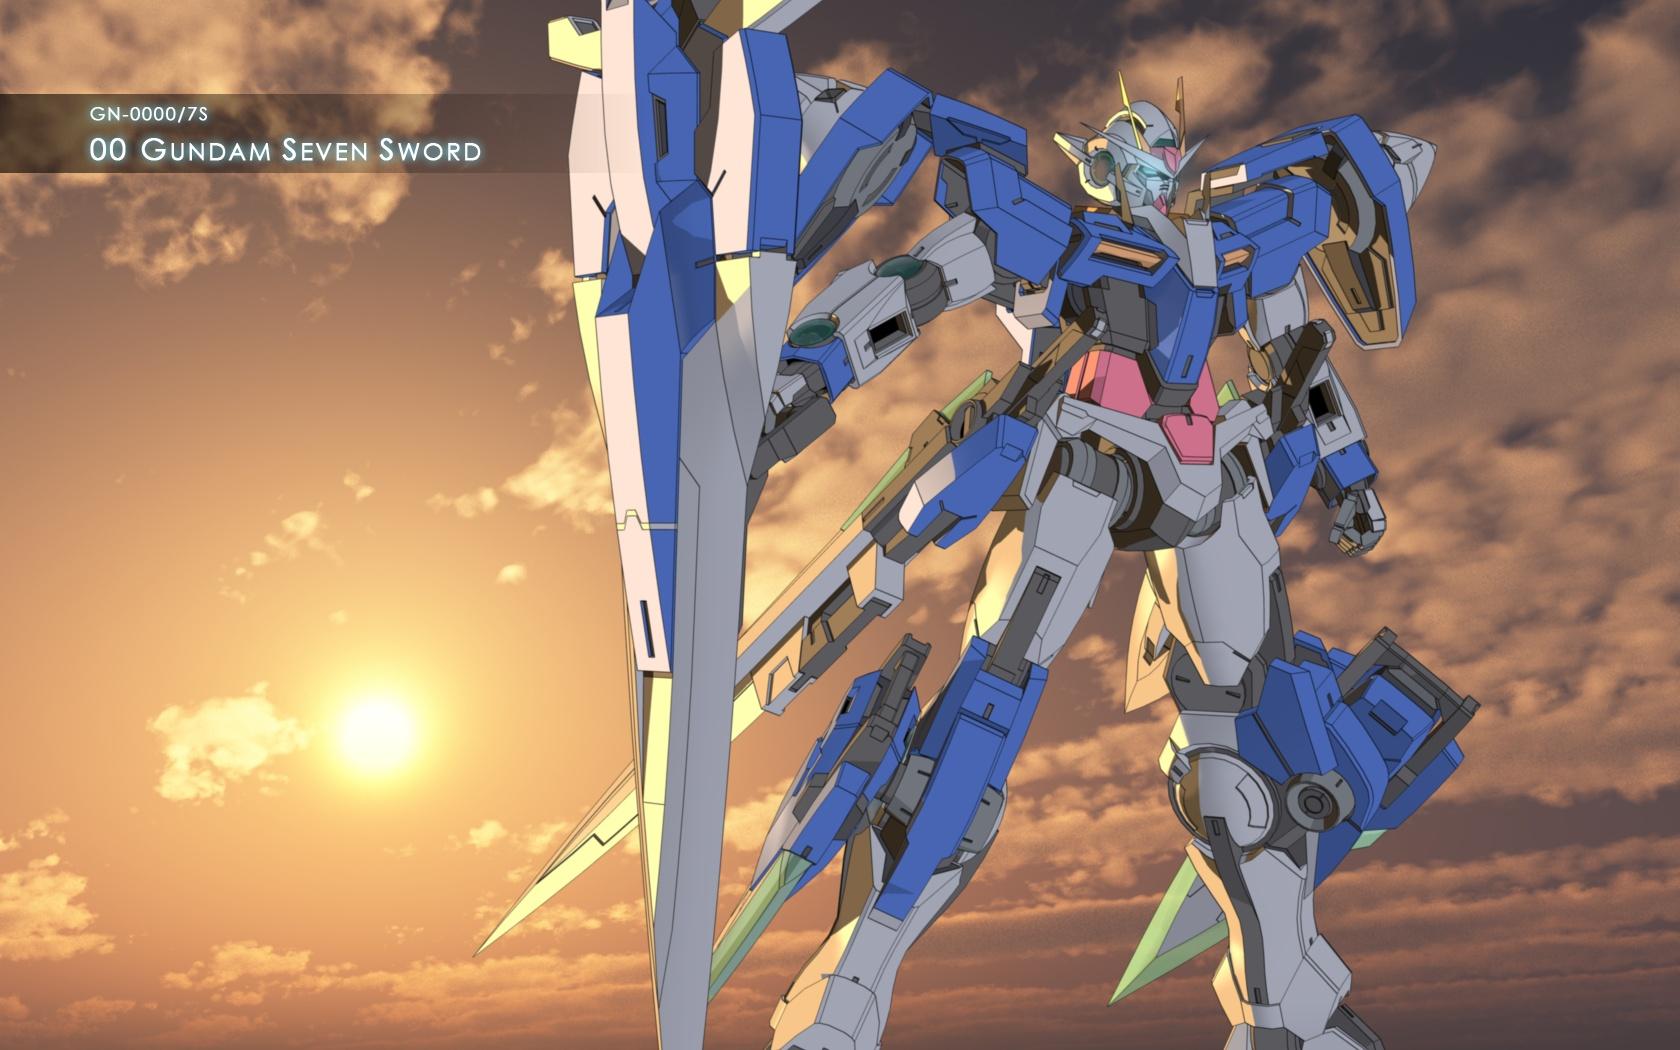 Gundam 00 Quanta Wallpaper